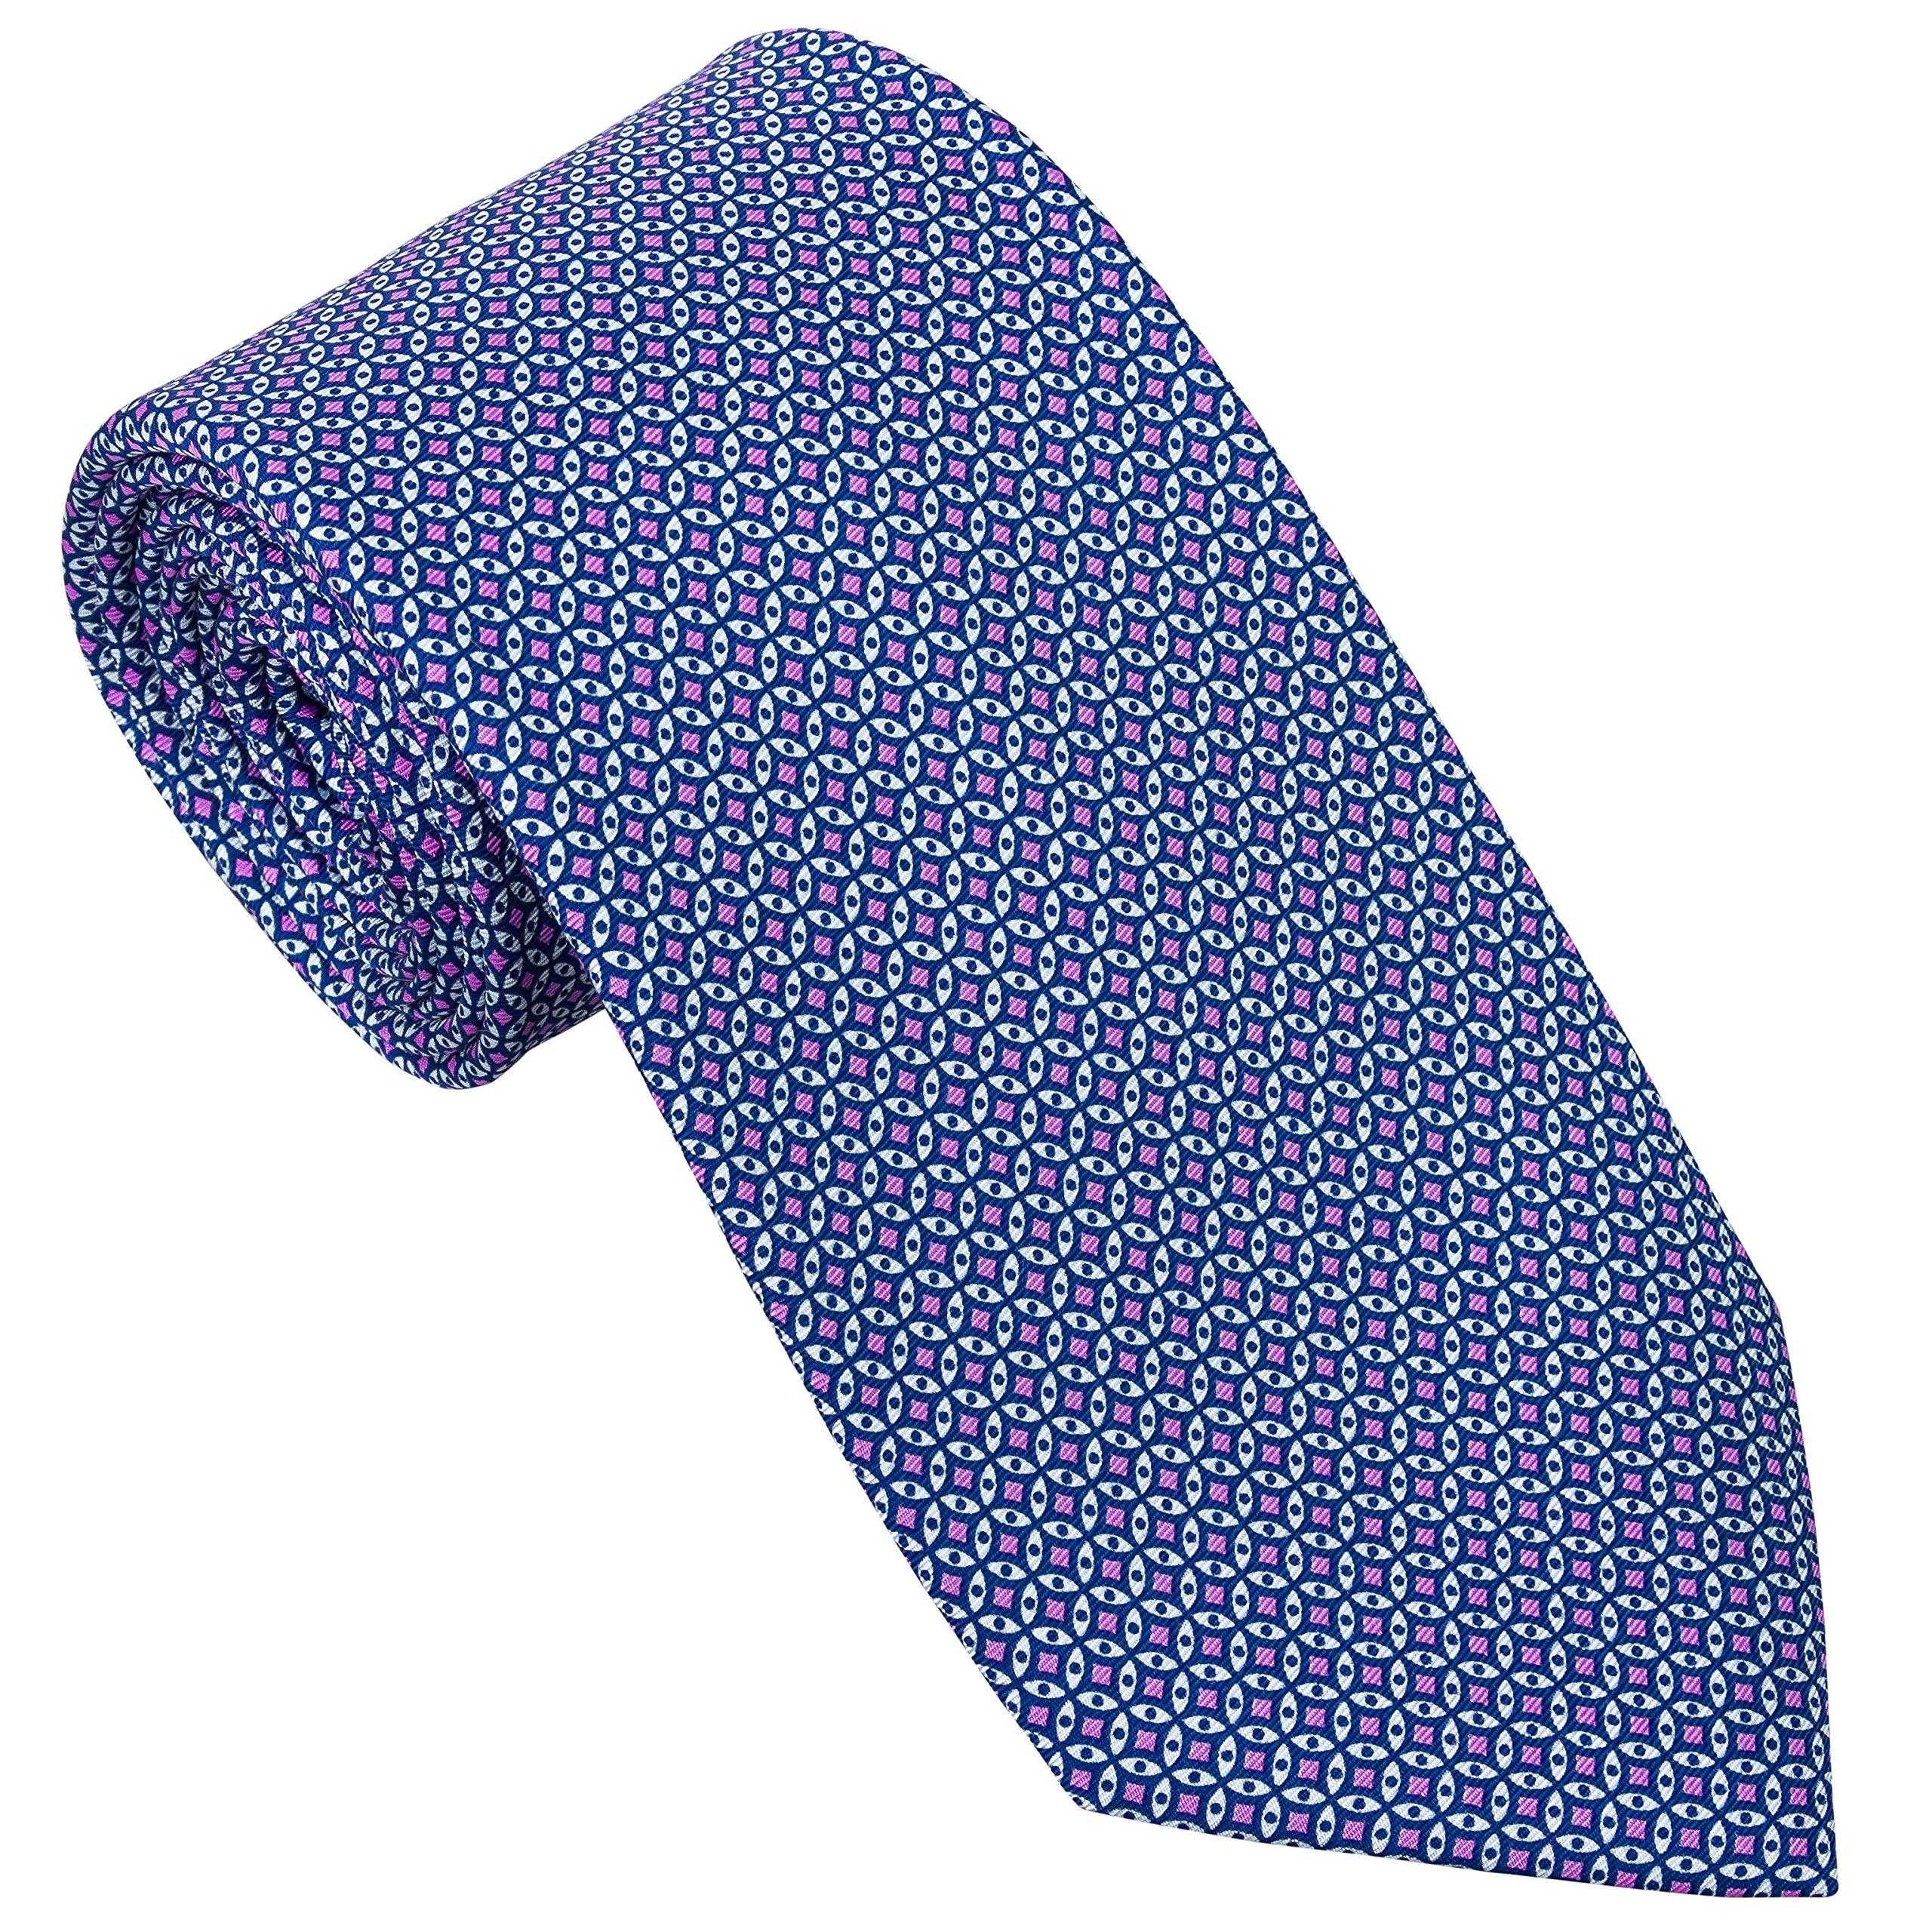 Sebastien Grey Men's 7-Fold Silk Tie (Lavender Navy Stained Glass)